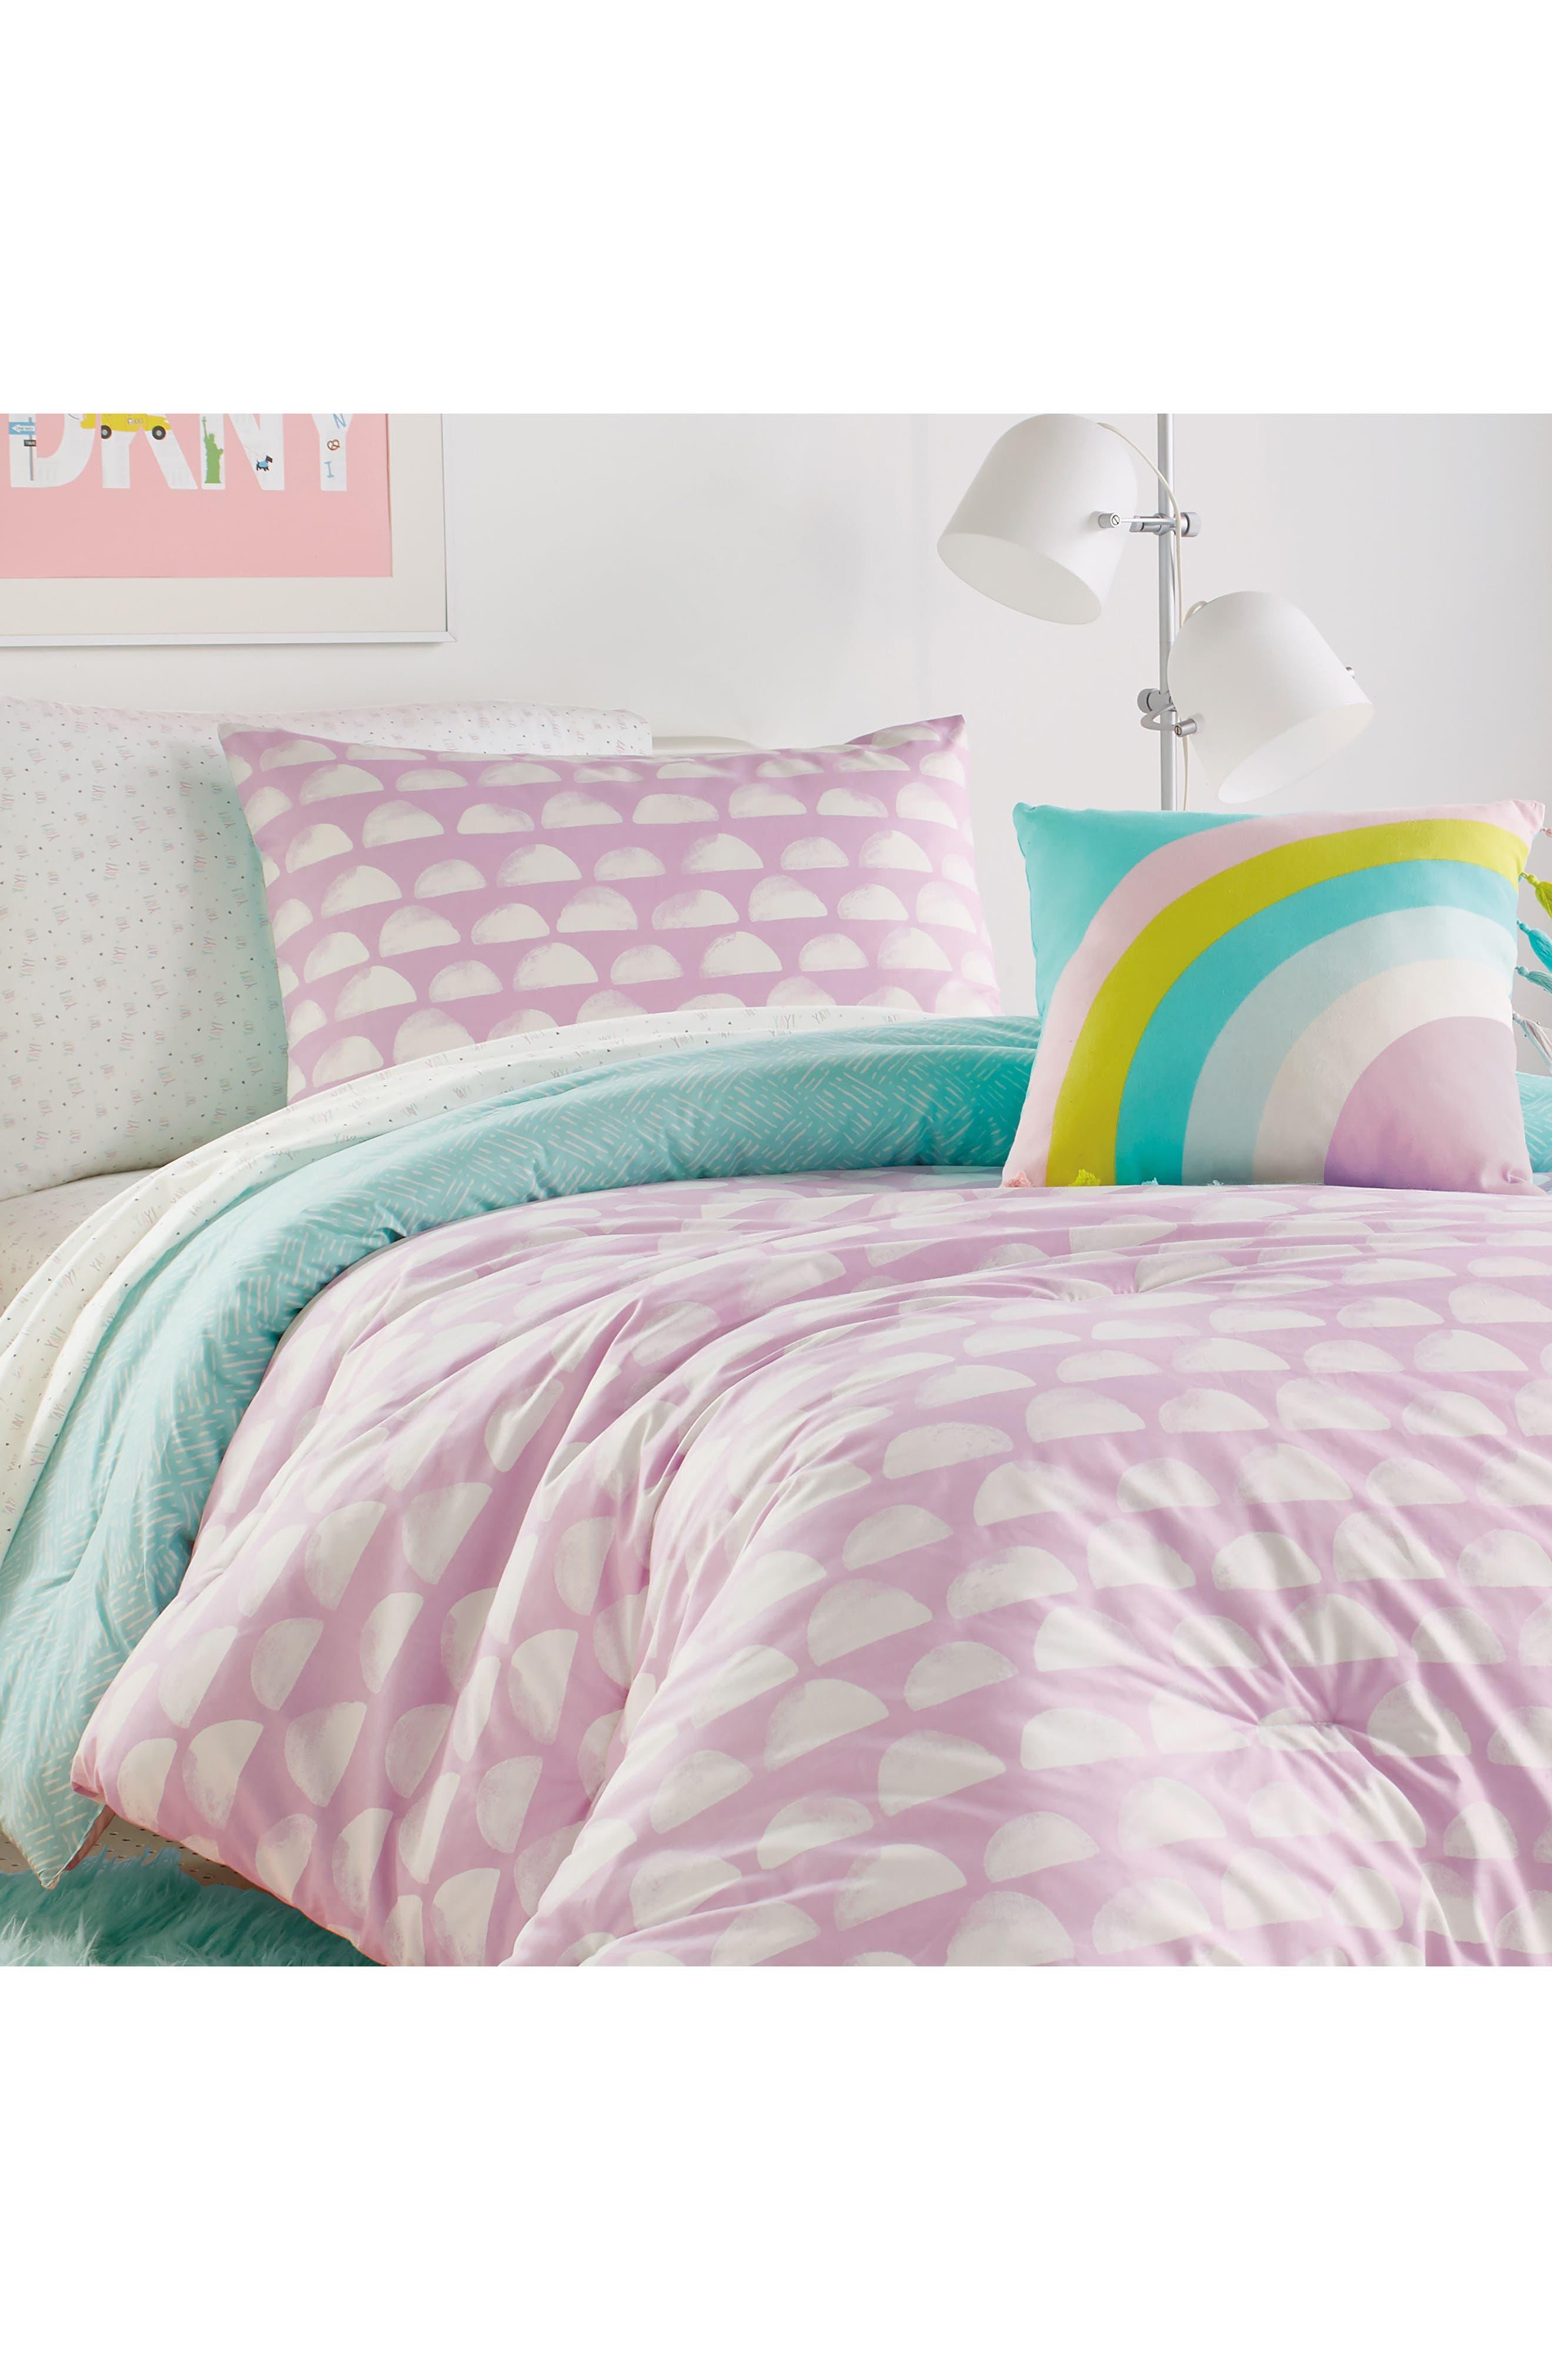 DKNY, Over the Moon Duvet, Sham & Accent Pillow Set, Main thumbnail 1, color, PURPLE